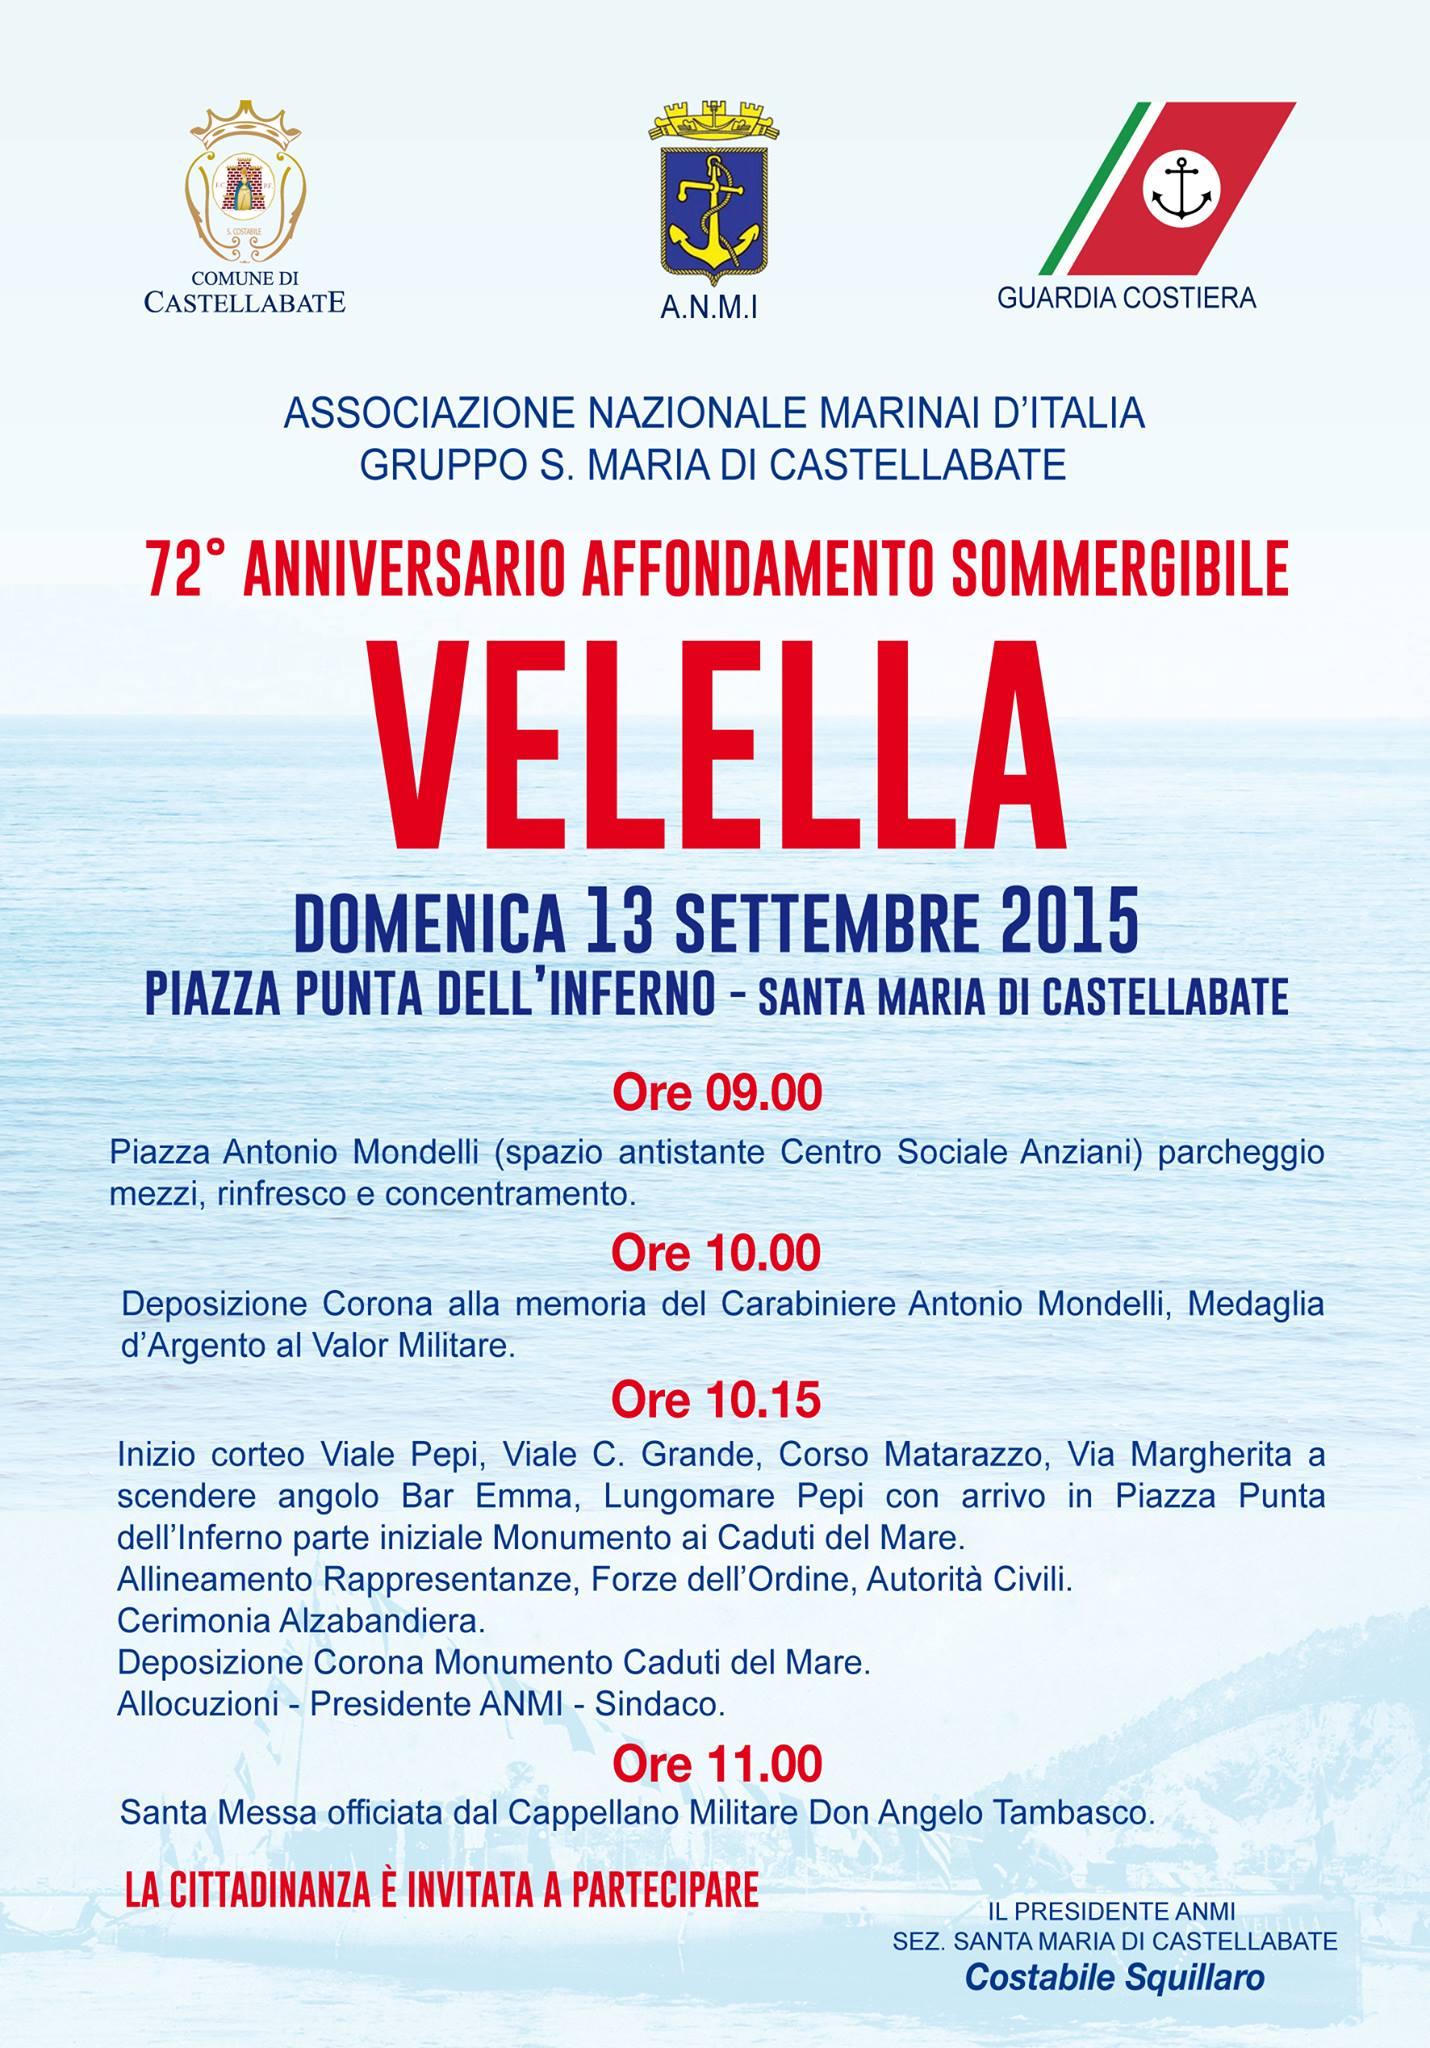 Anniversario affondamento Velella 2015 Castellabate